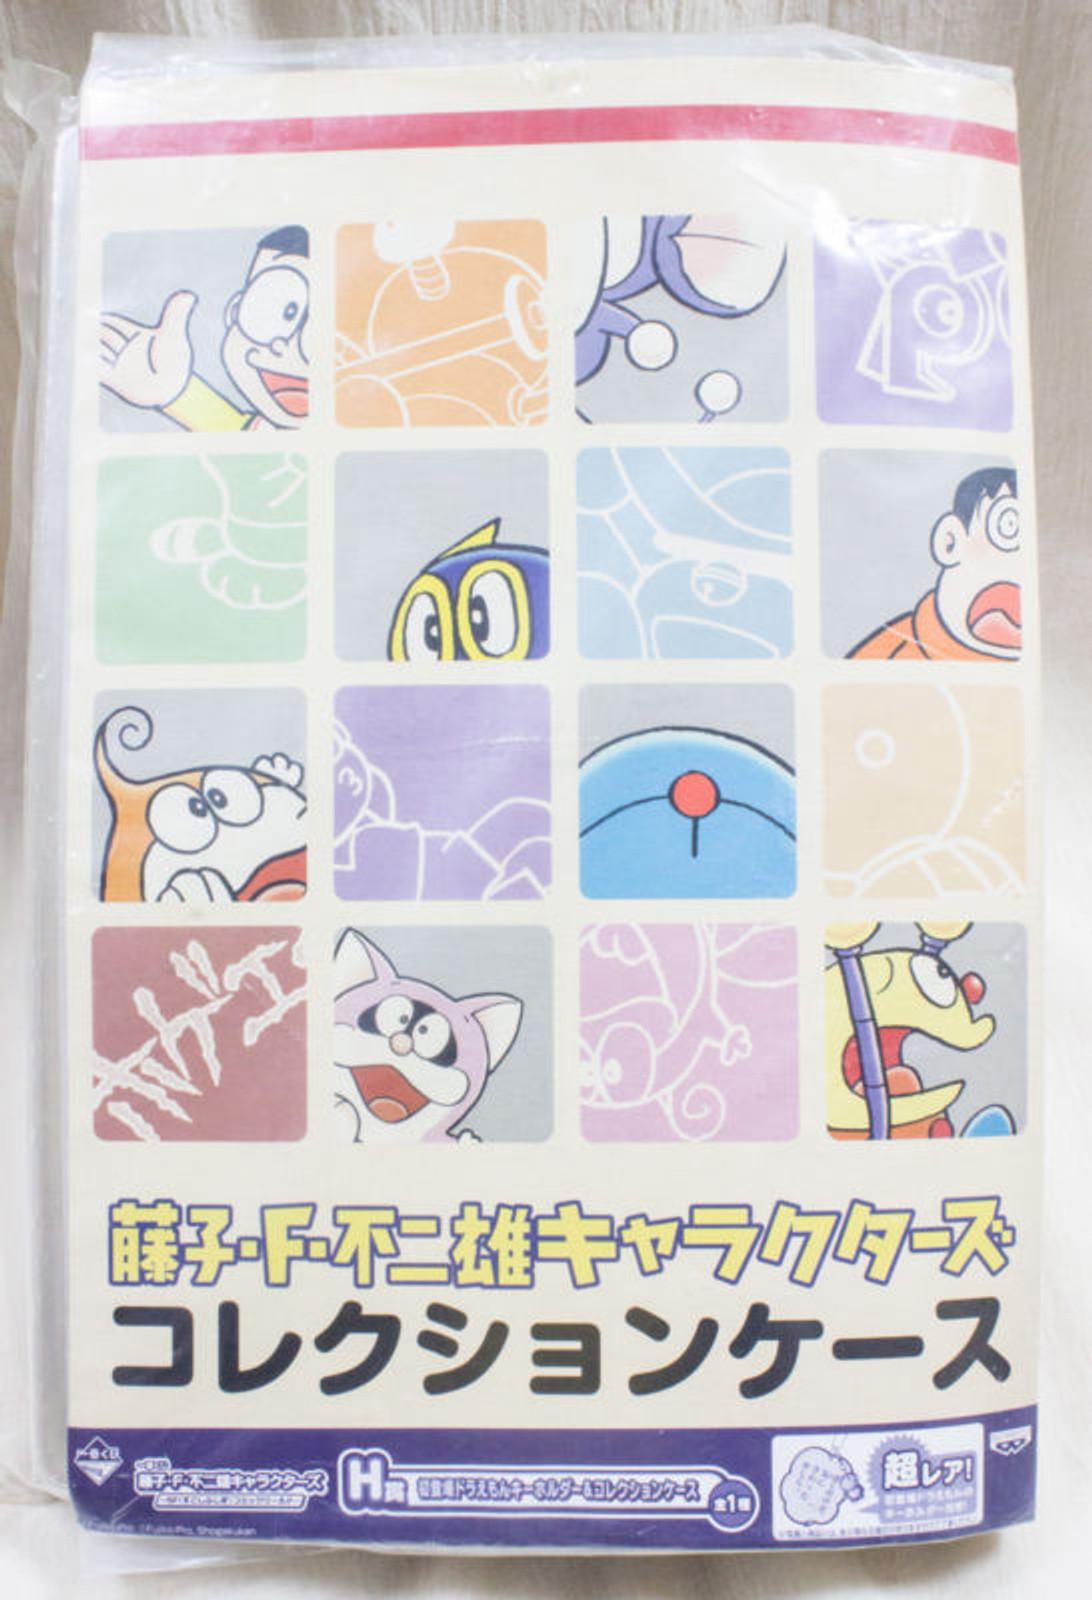 Fujiko F Fujio Characters Collection Case for Key Chains JAPAN ANIME MANGA